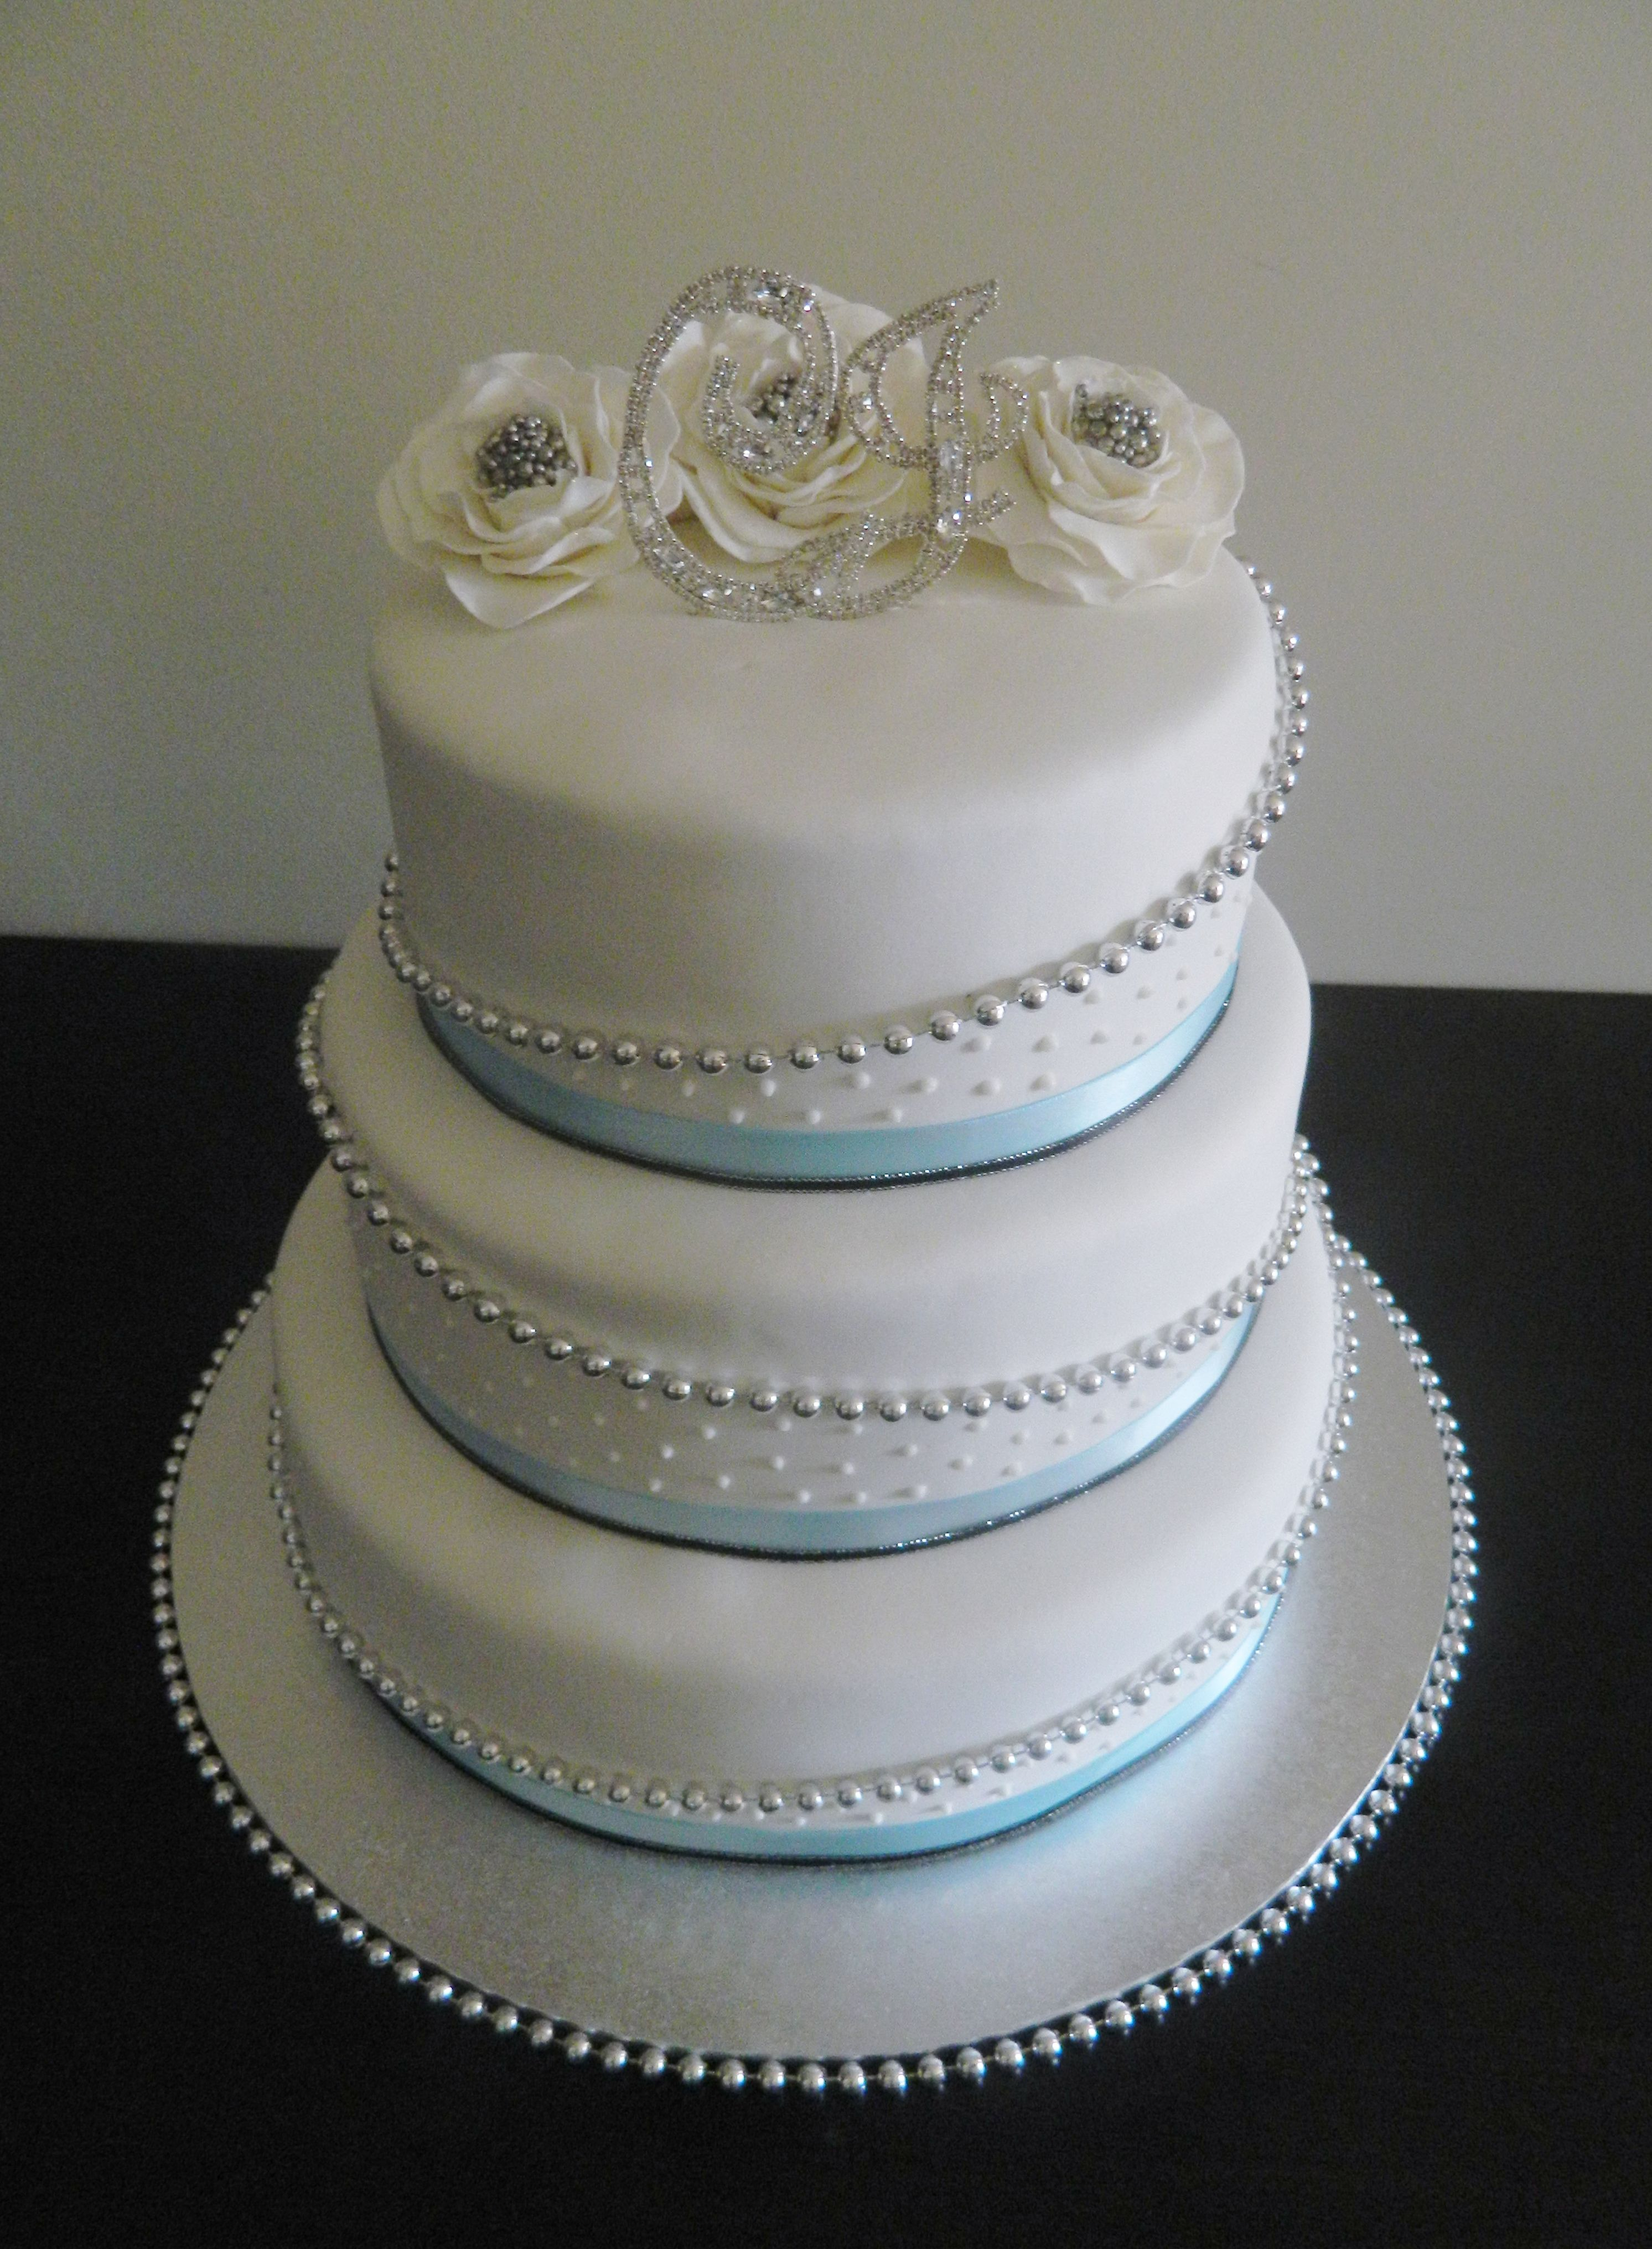 Wedding Cake Blue Silver Silver Wedding Cake Round Wedding Cakes Wedding Cakes Blue